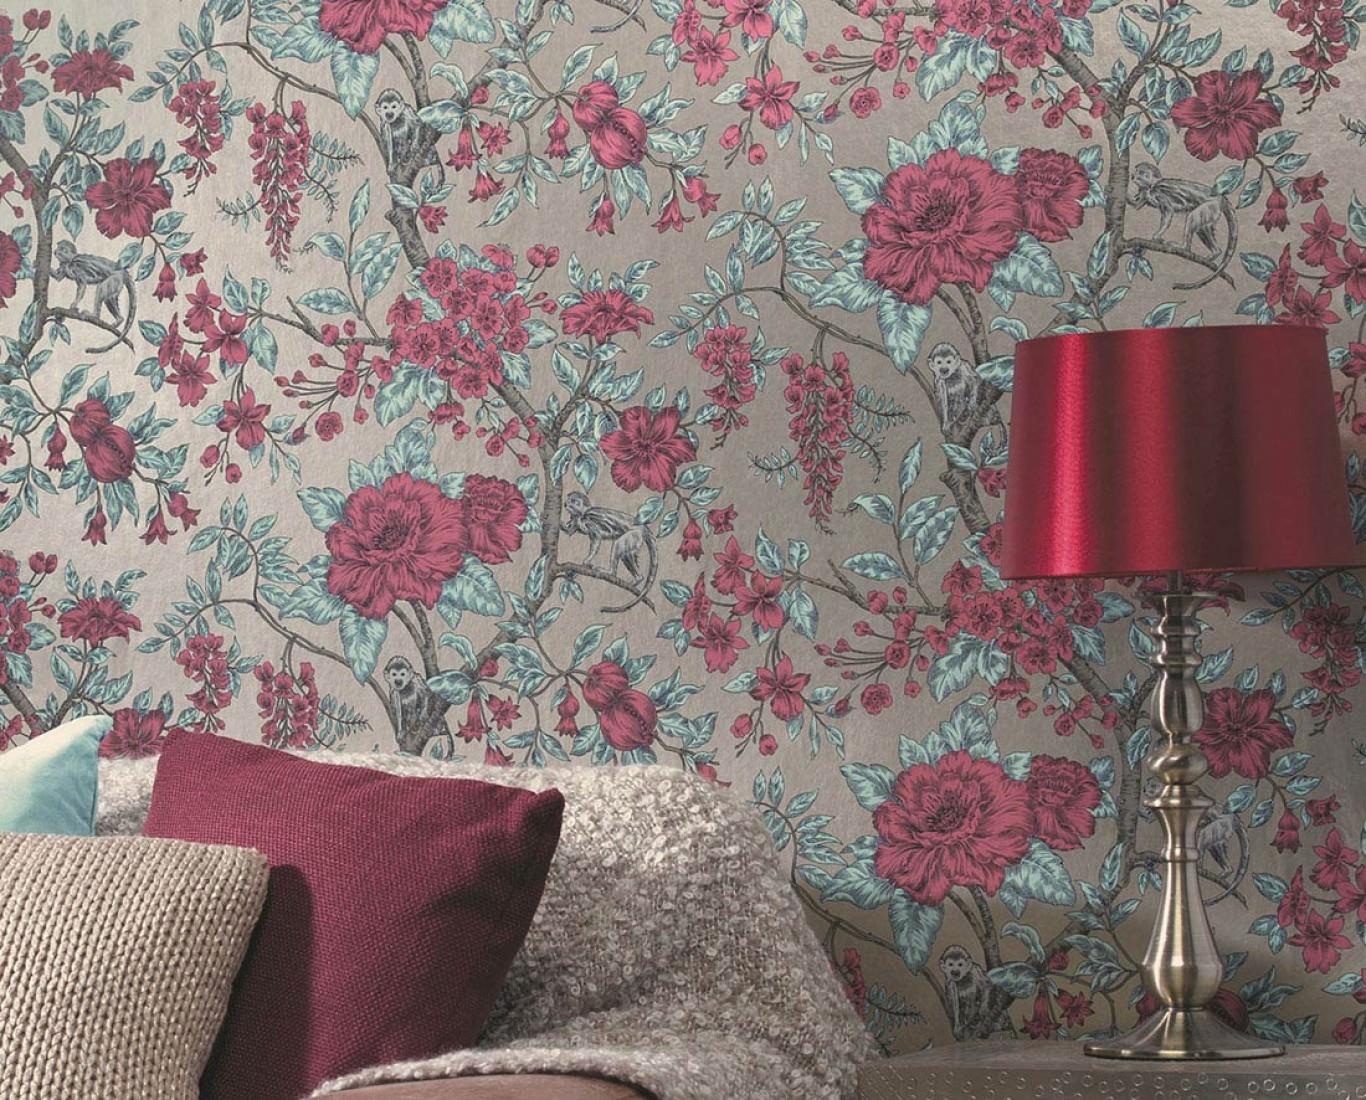 tapete soraya perlbeige gr ngrau lichtgr n rotviolett schwarz tapeten der 70er. Black Bedroom Furniture Sets. Home Design Ideas